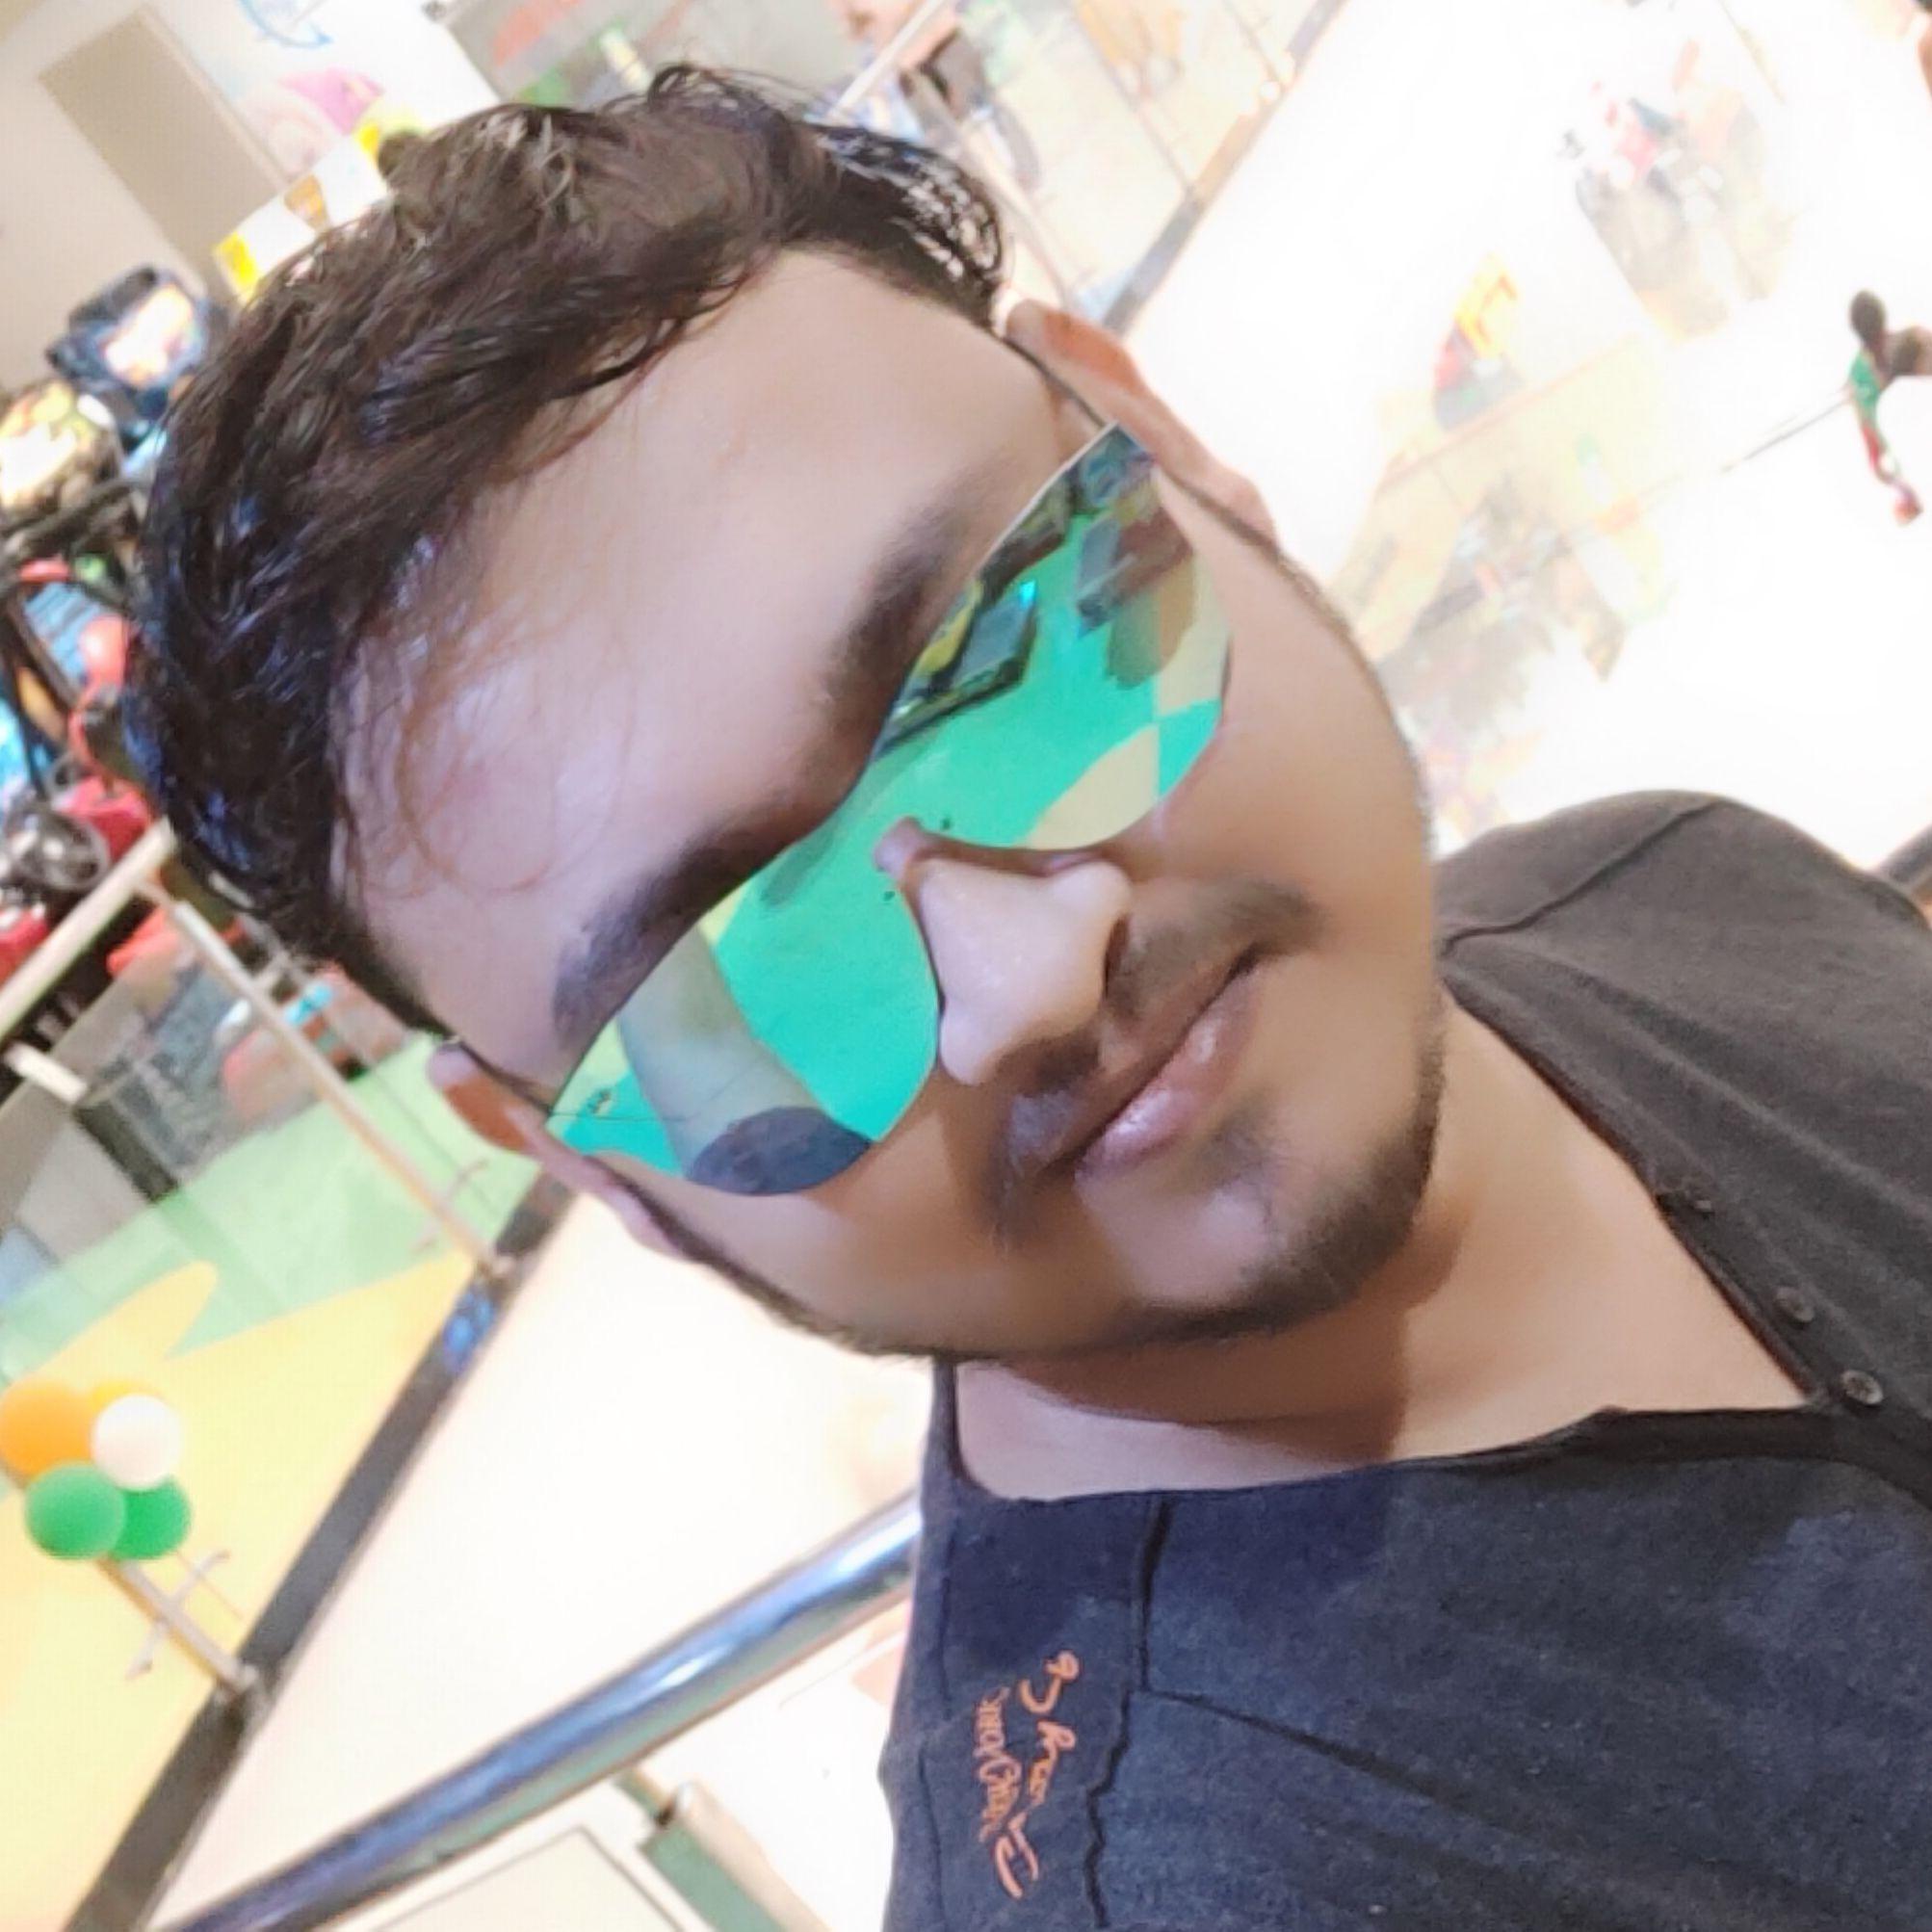 sandeep meshram